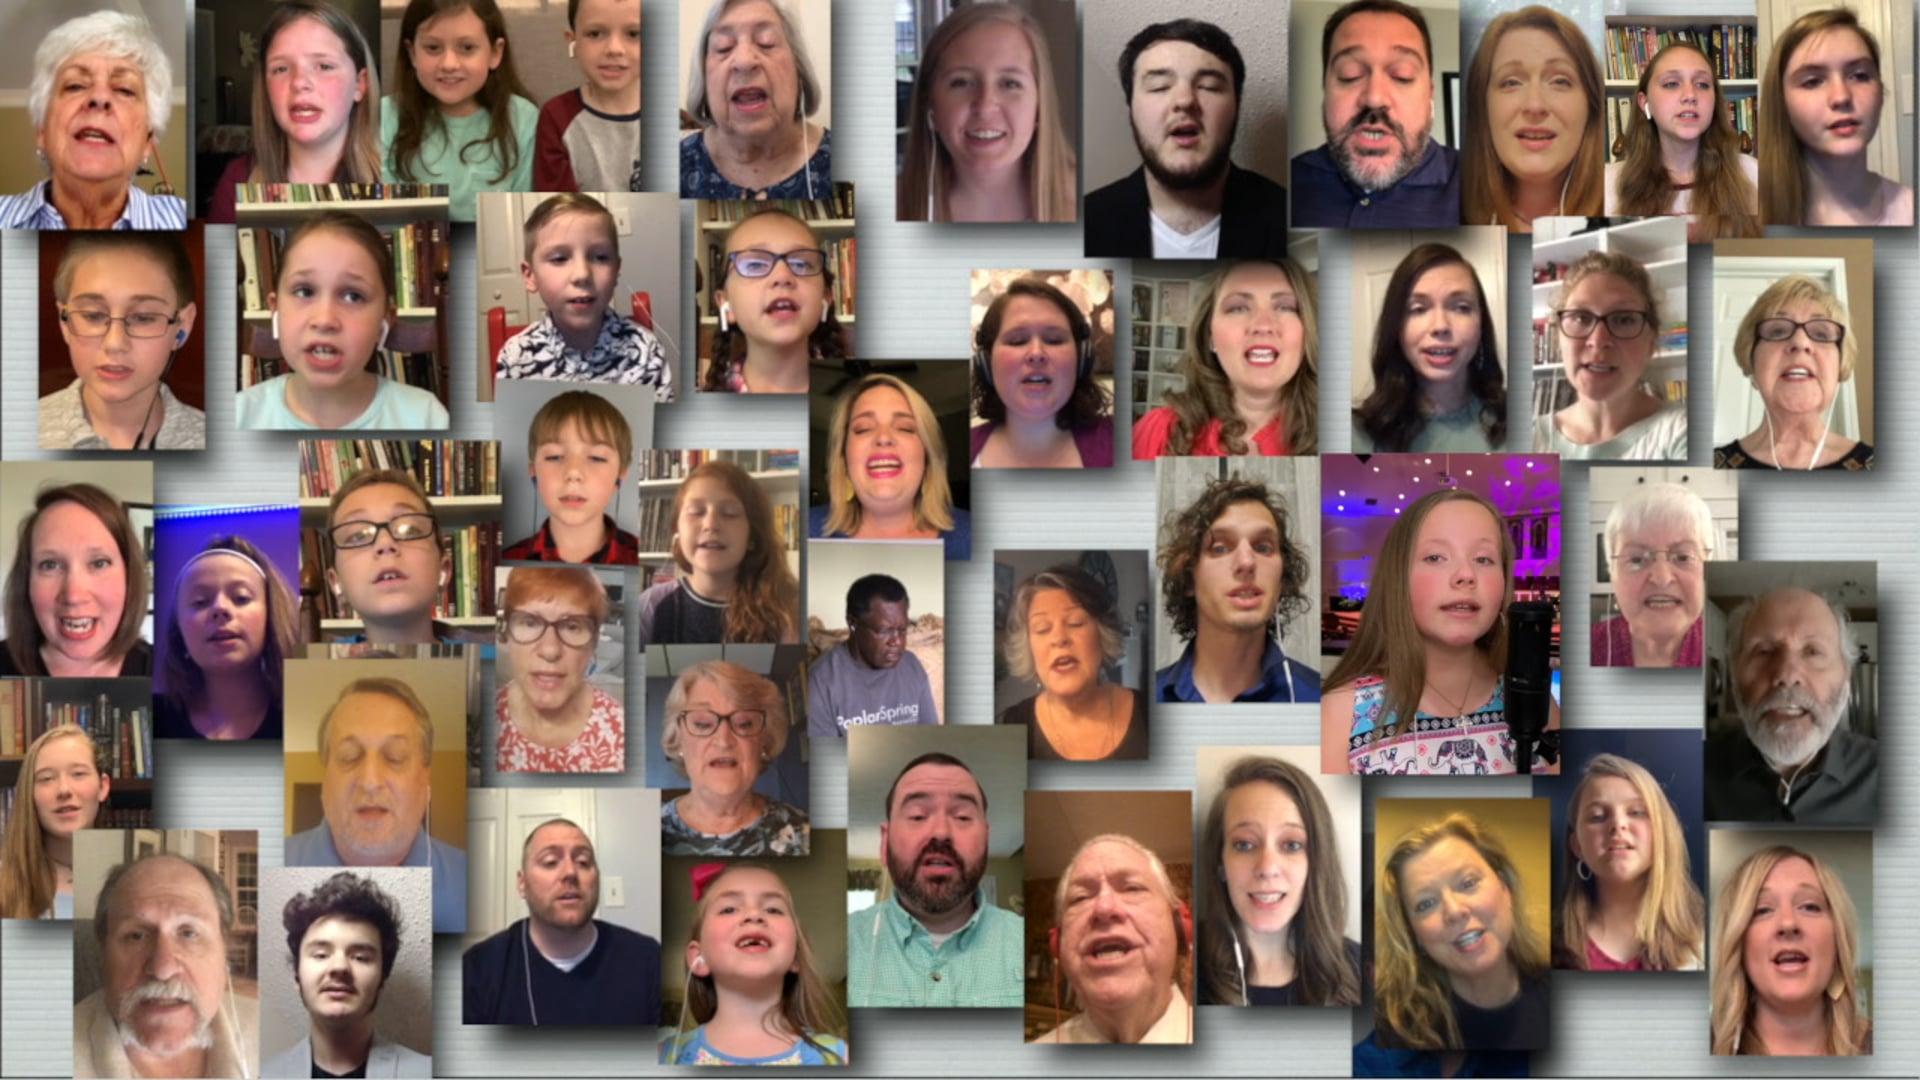 Tis So Sweet - Poplar Springs Choir